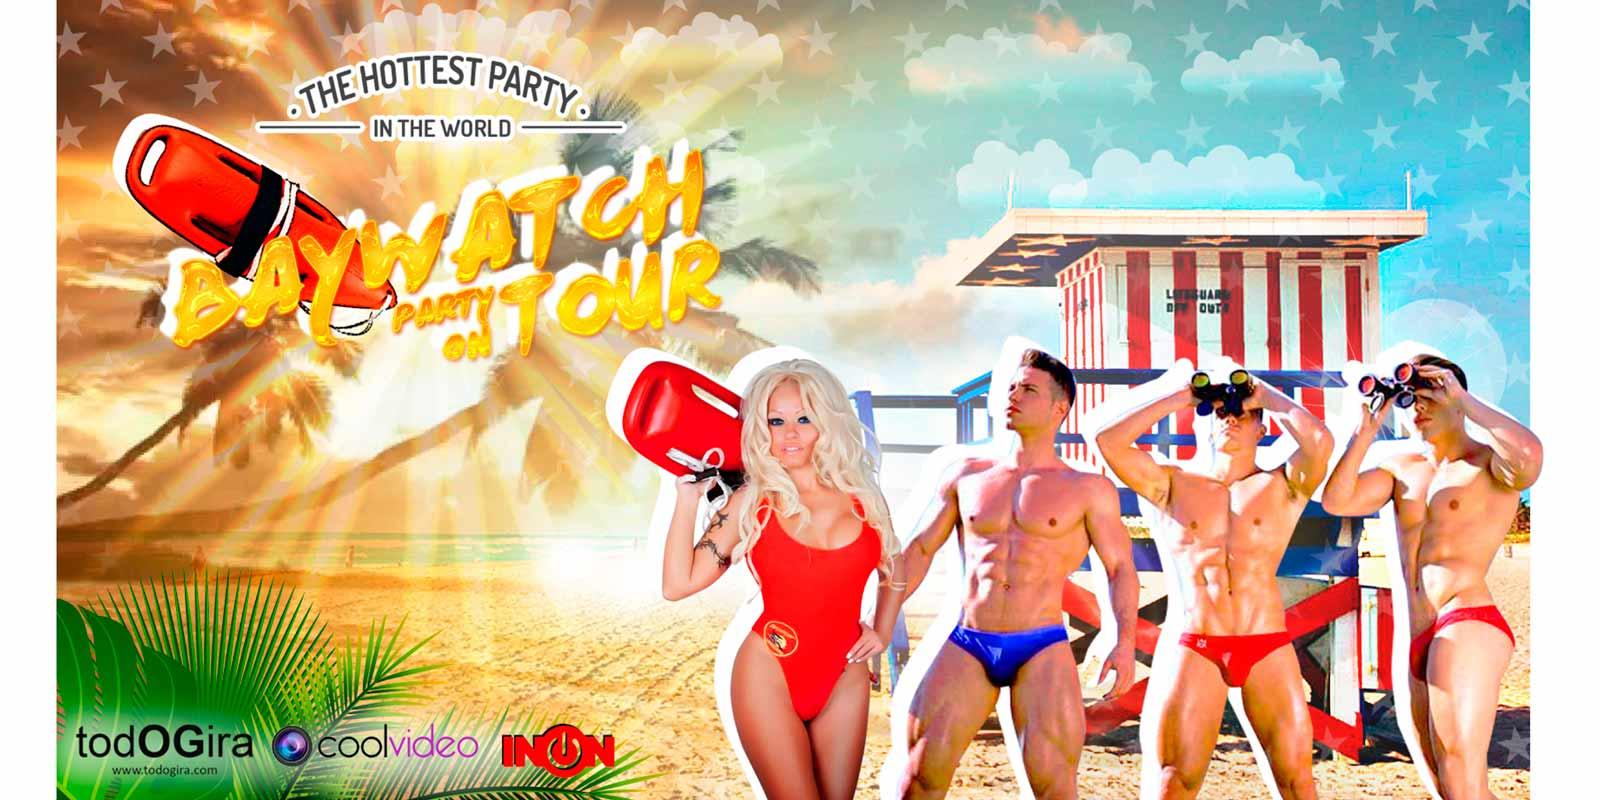 Baywatch Party Valencia